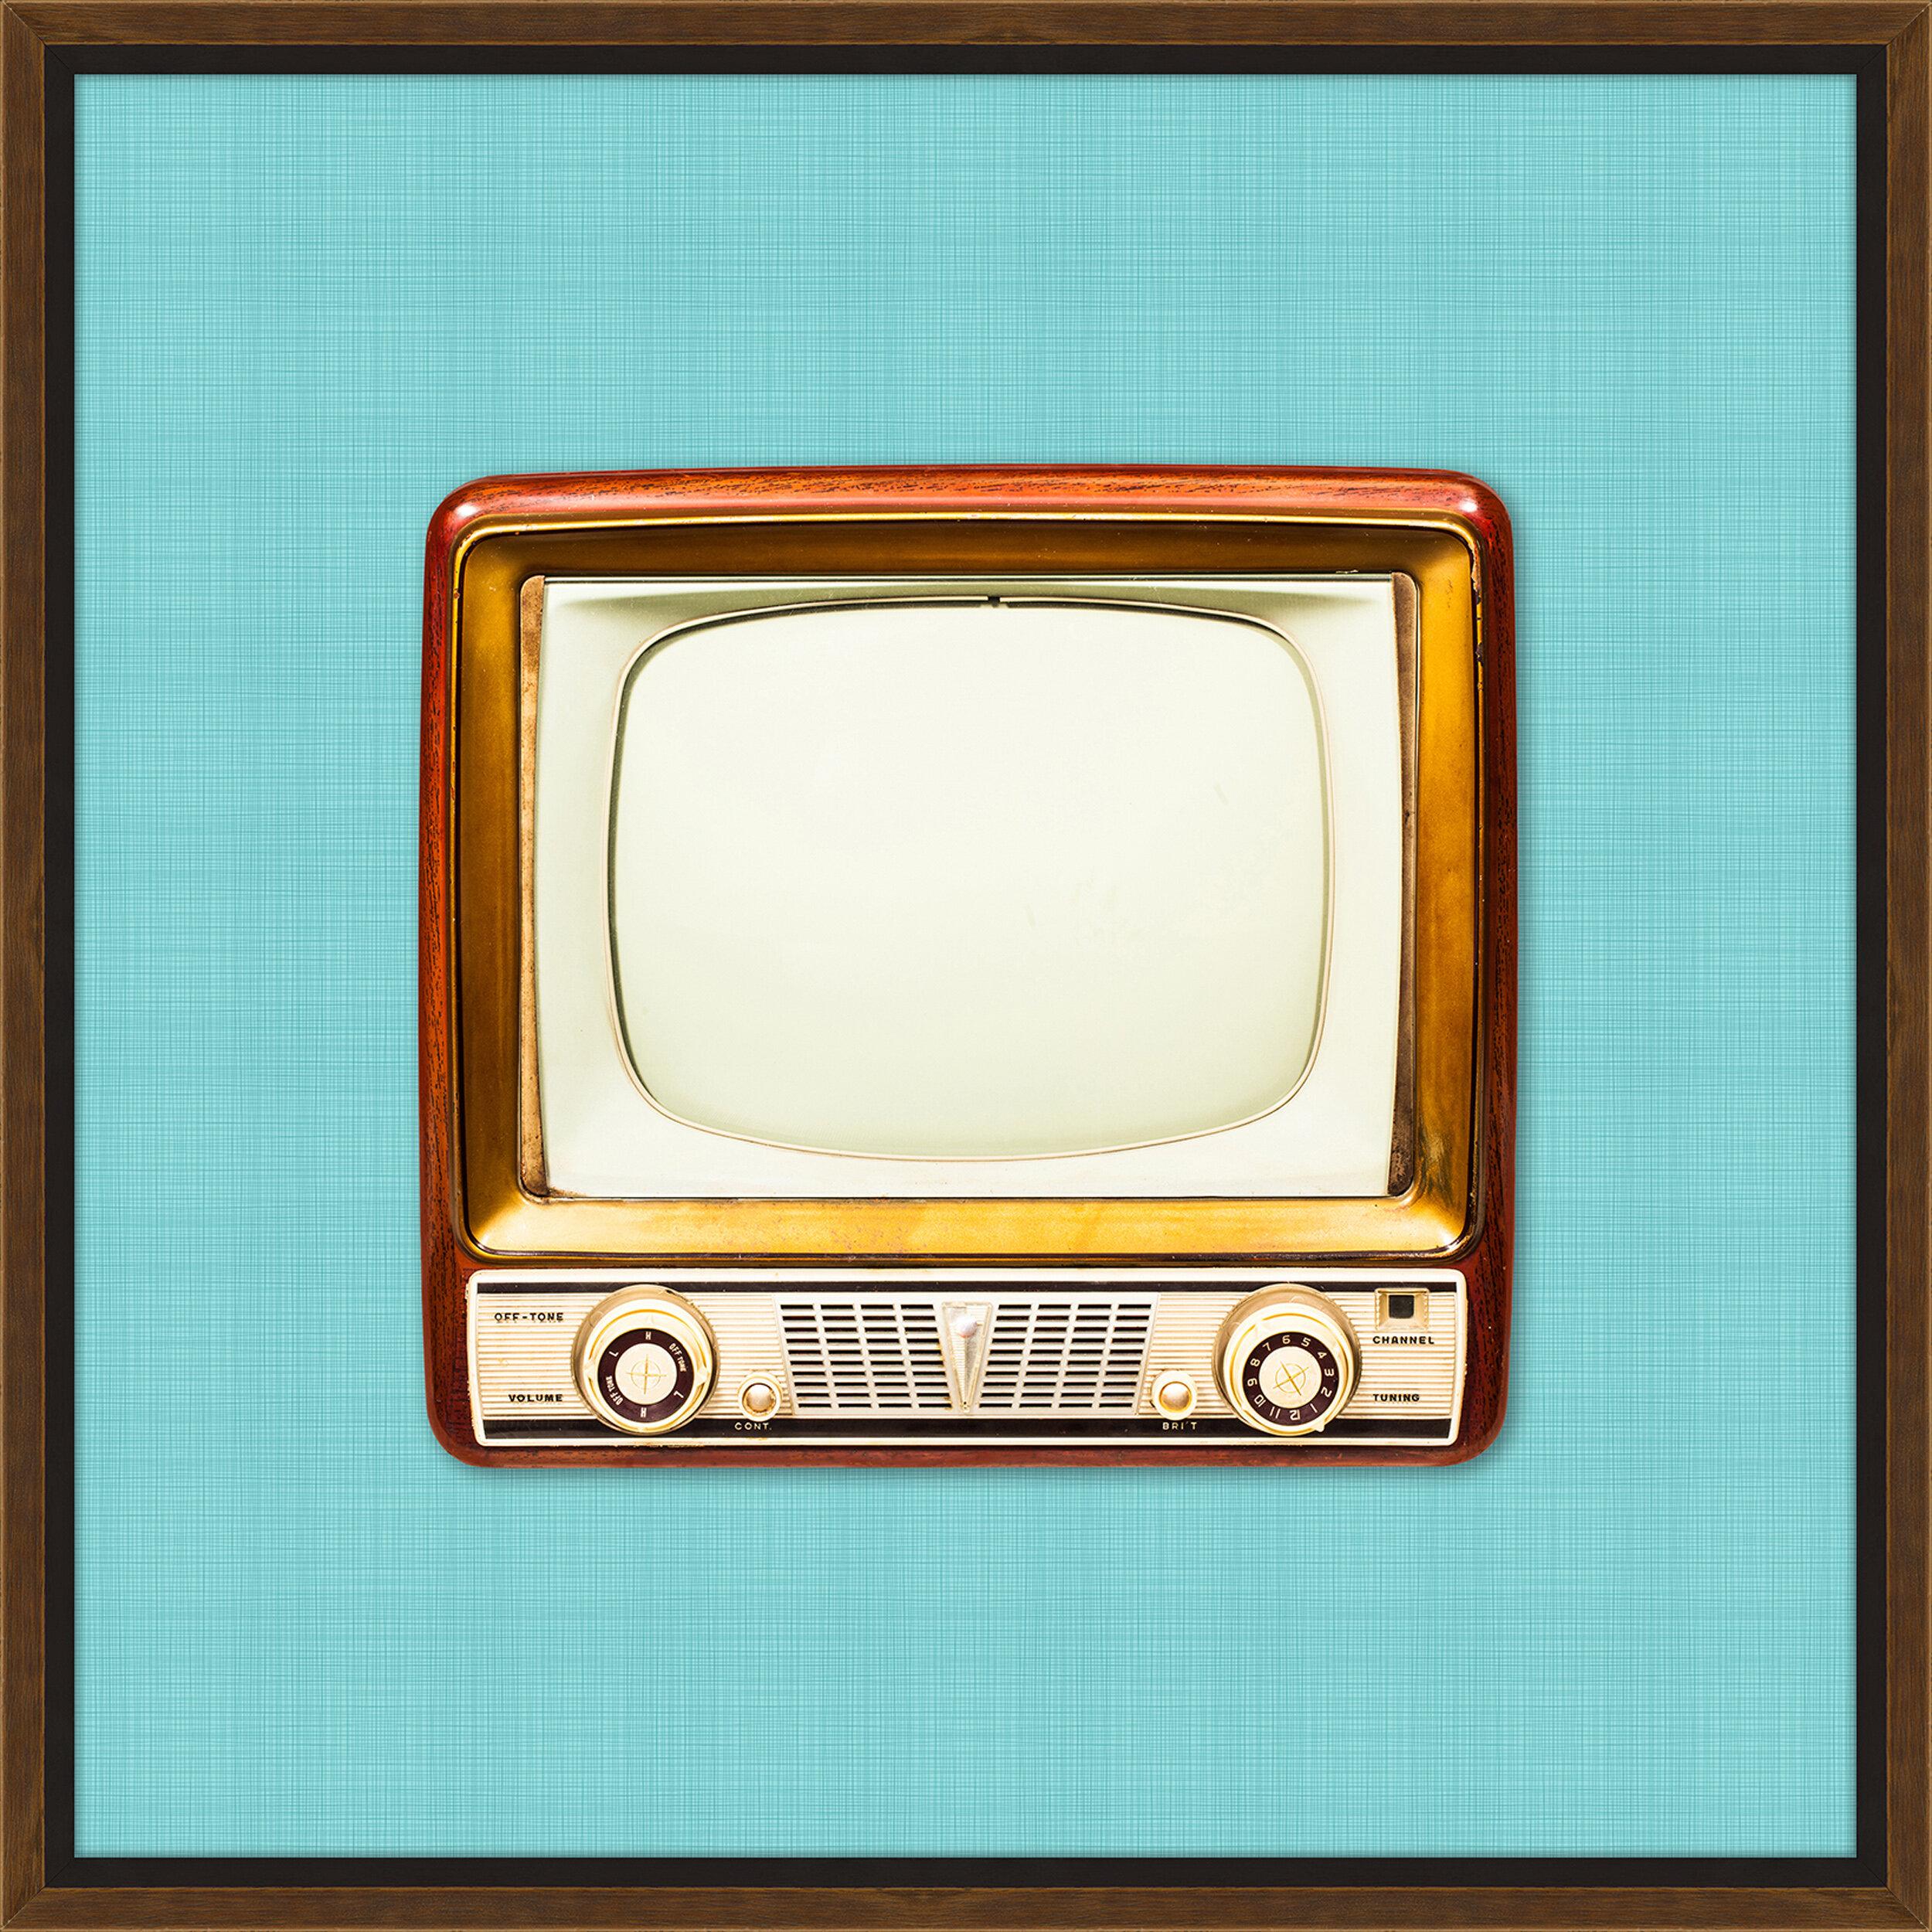 Melissa Van Hise Vintage Tv Framed Graphic Art Print Wayfair